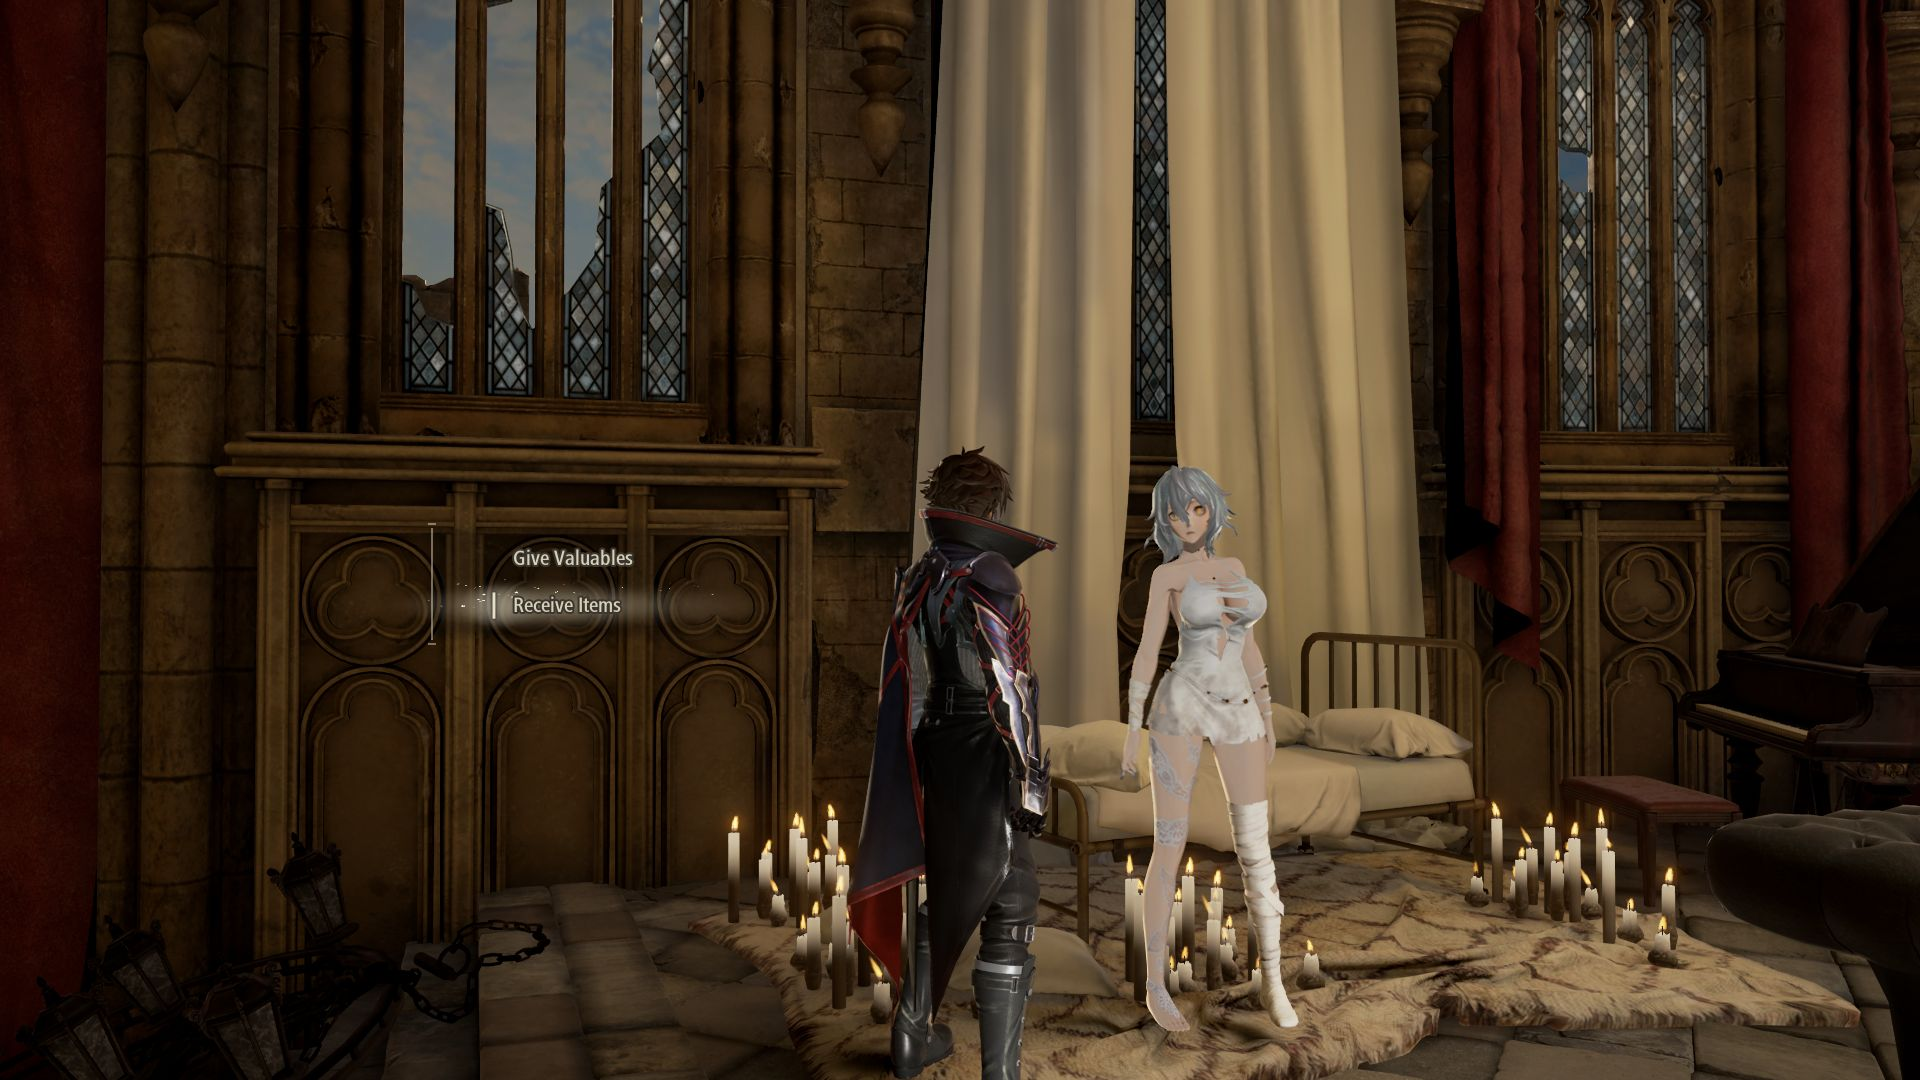 Code Vein New Screenshots Show Off Characters Amp More